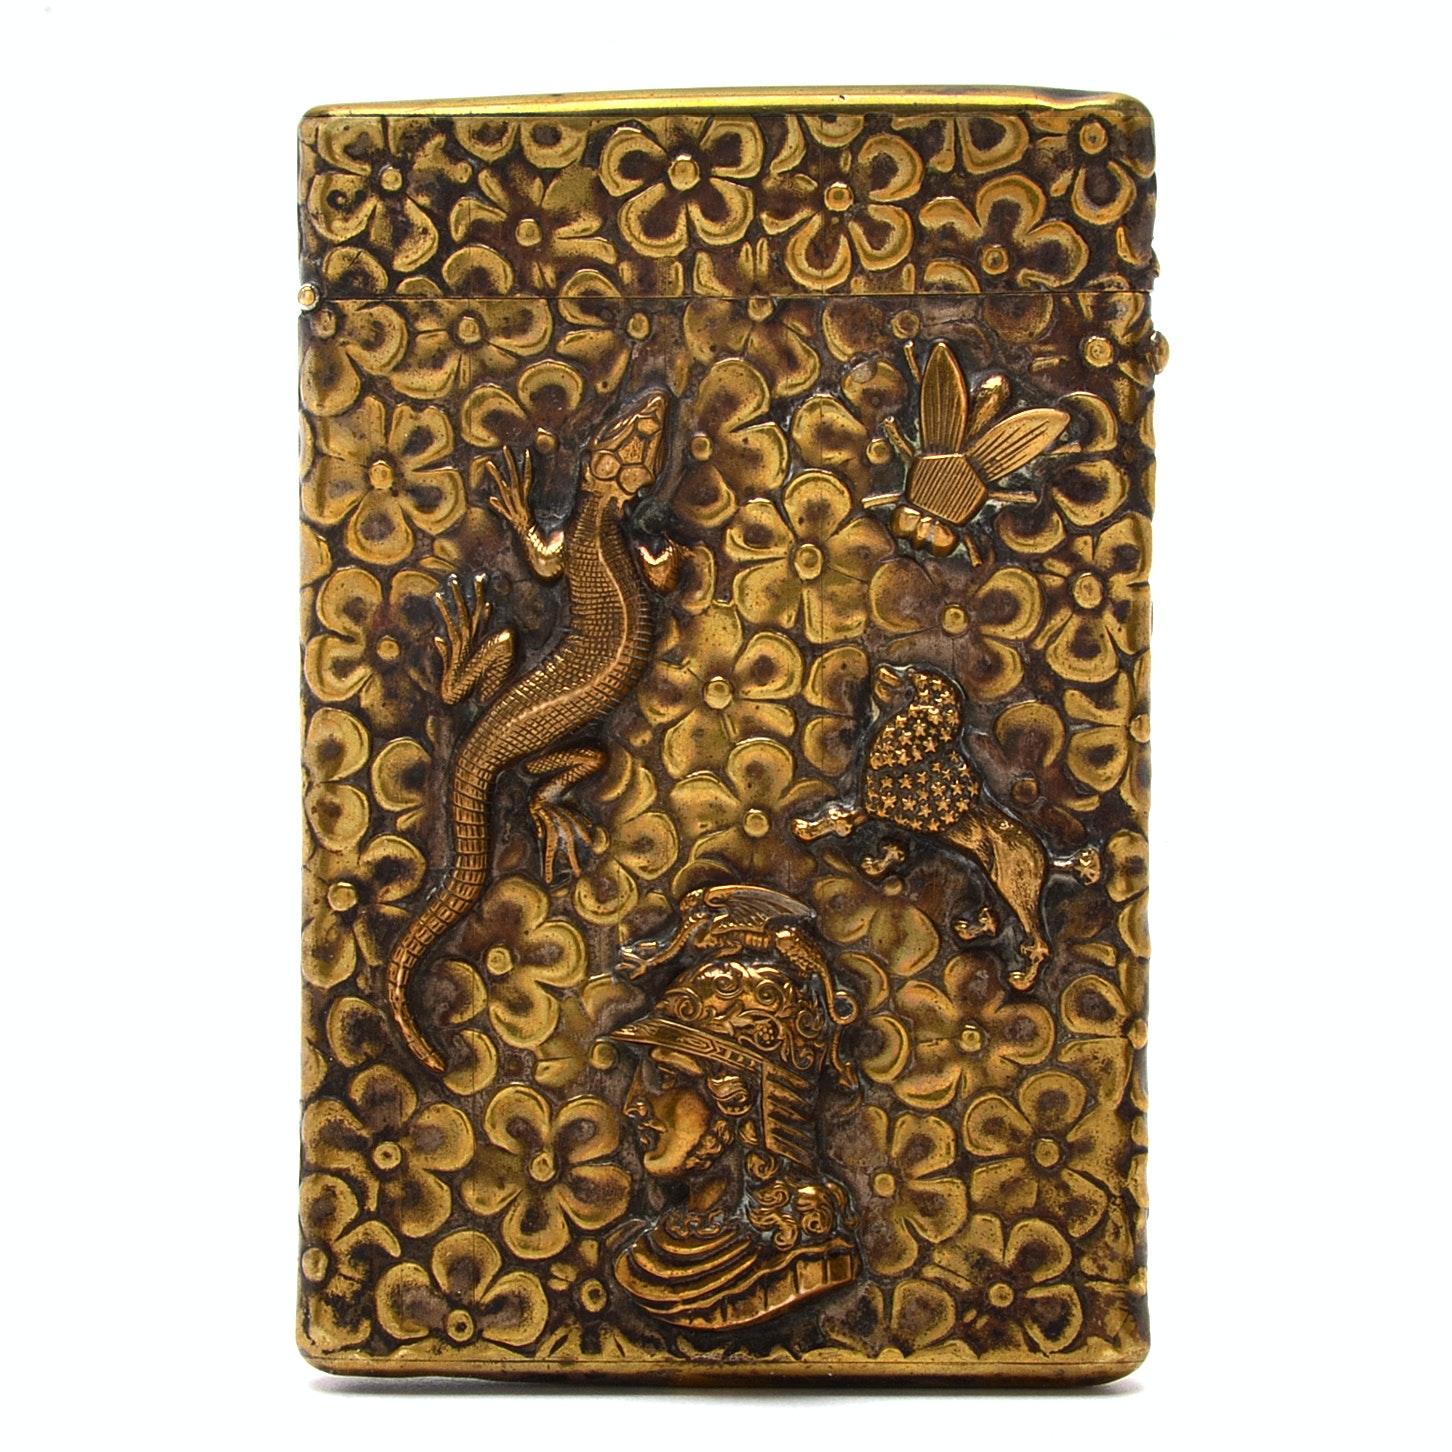 Vintage Brass Tone Embossed Hinged Card Holder